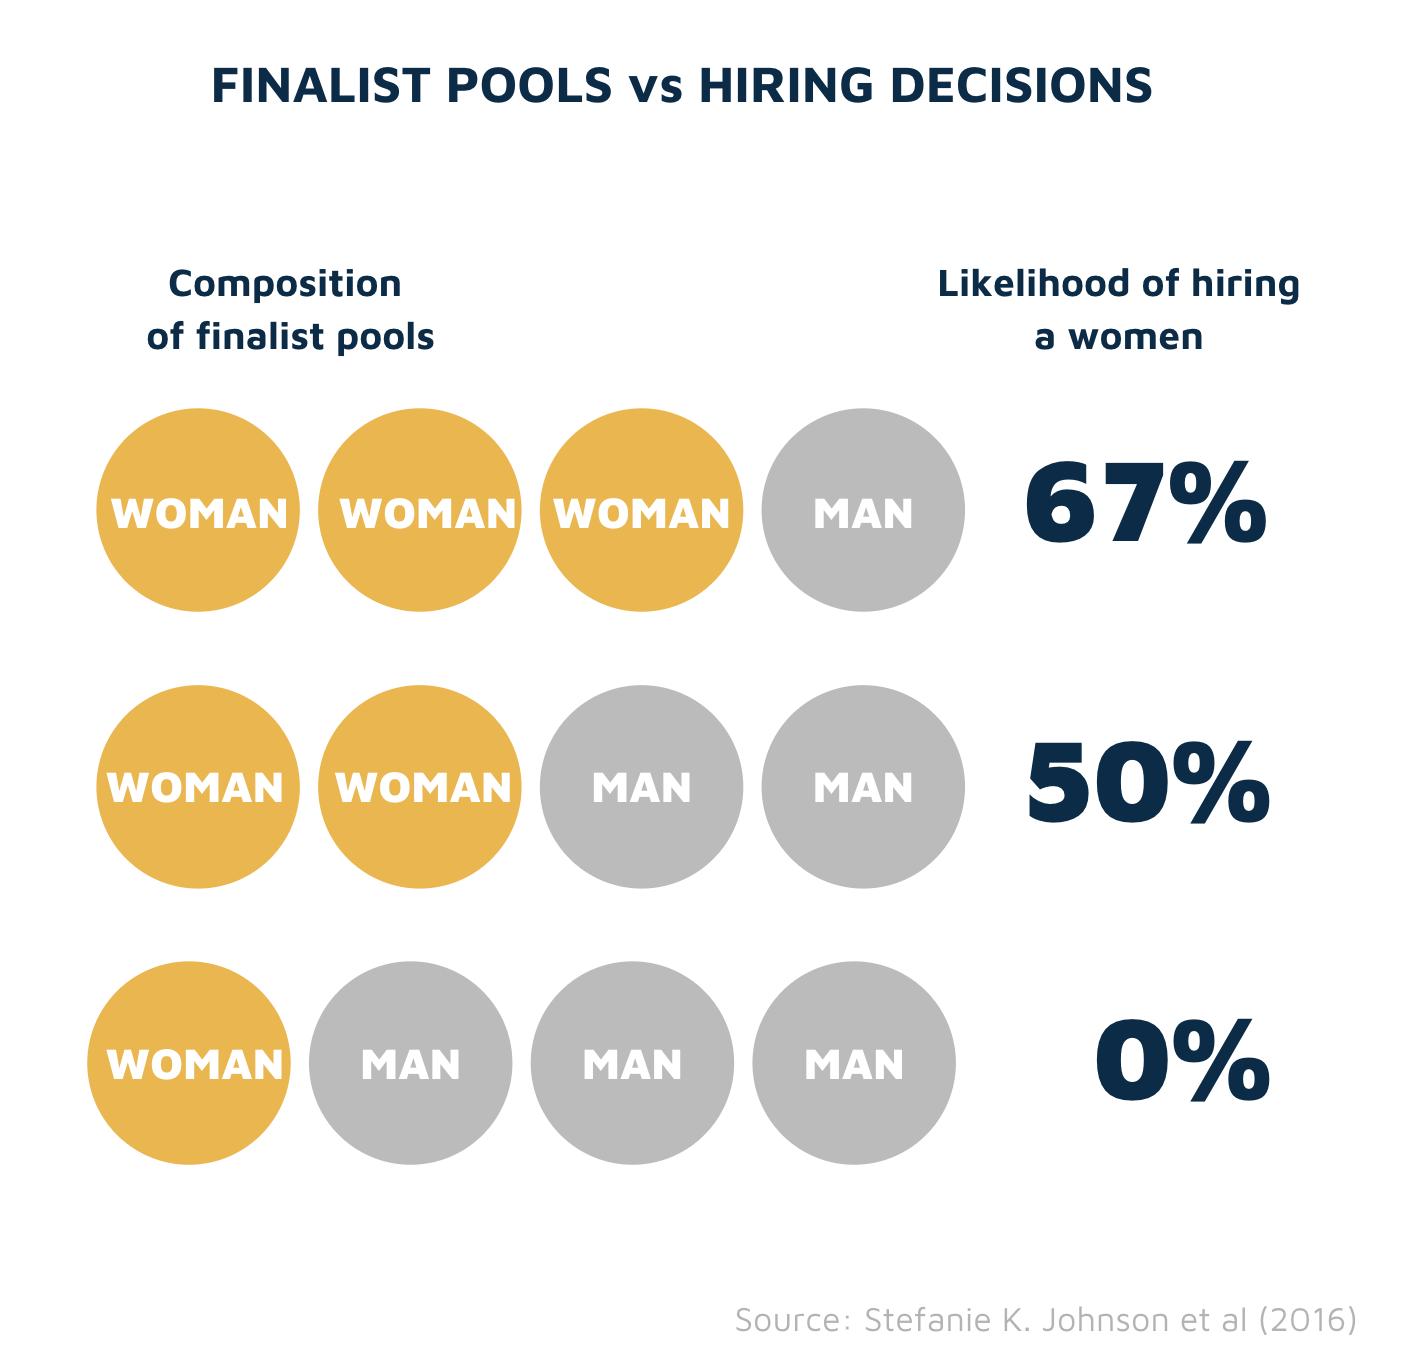 Finalist pool diversity vs hiring decisions